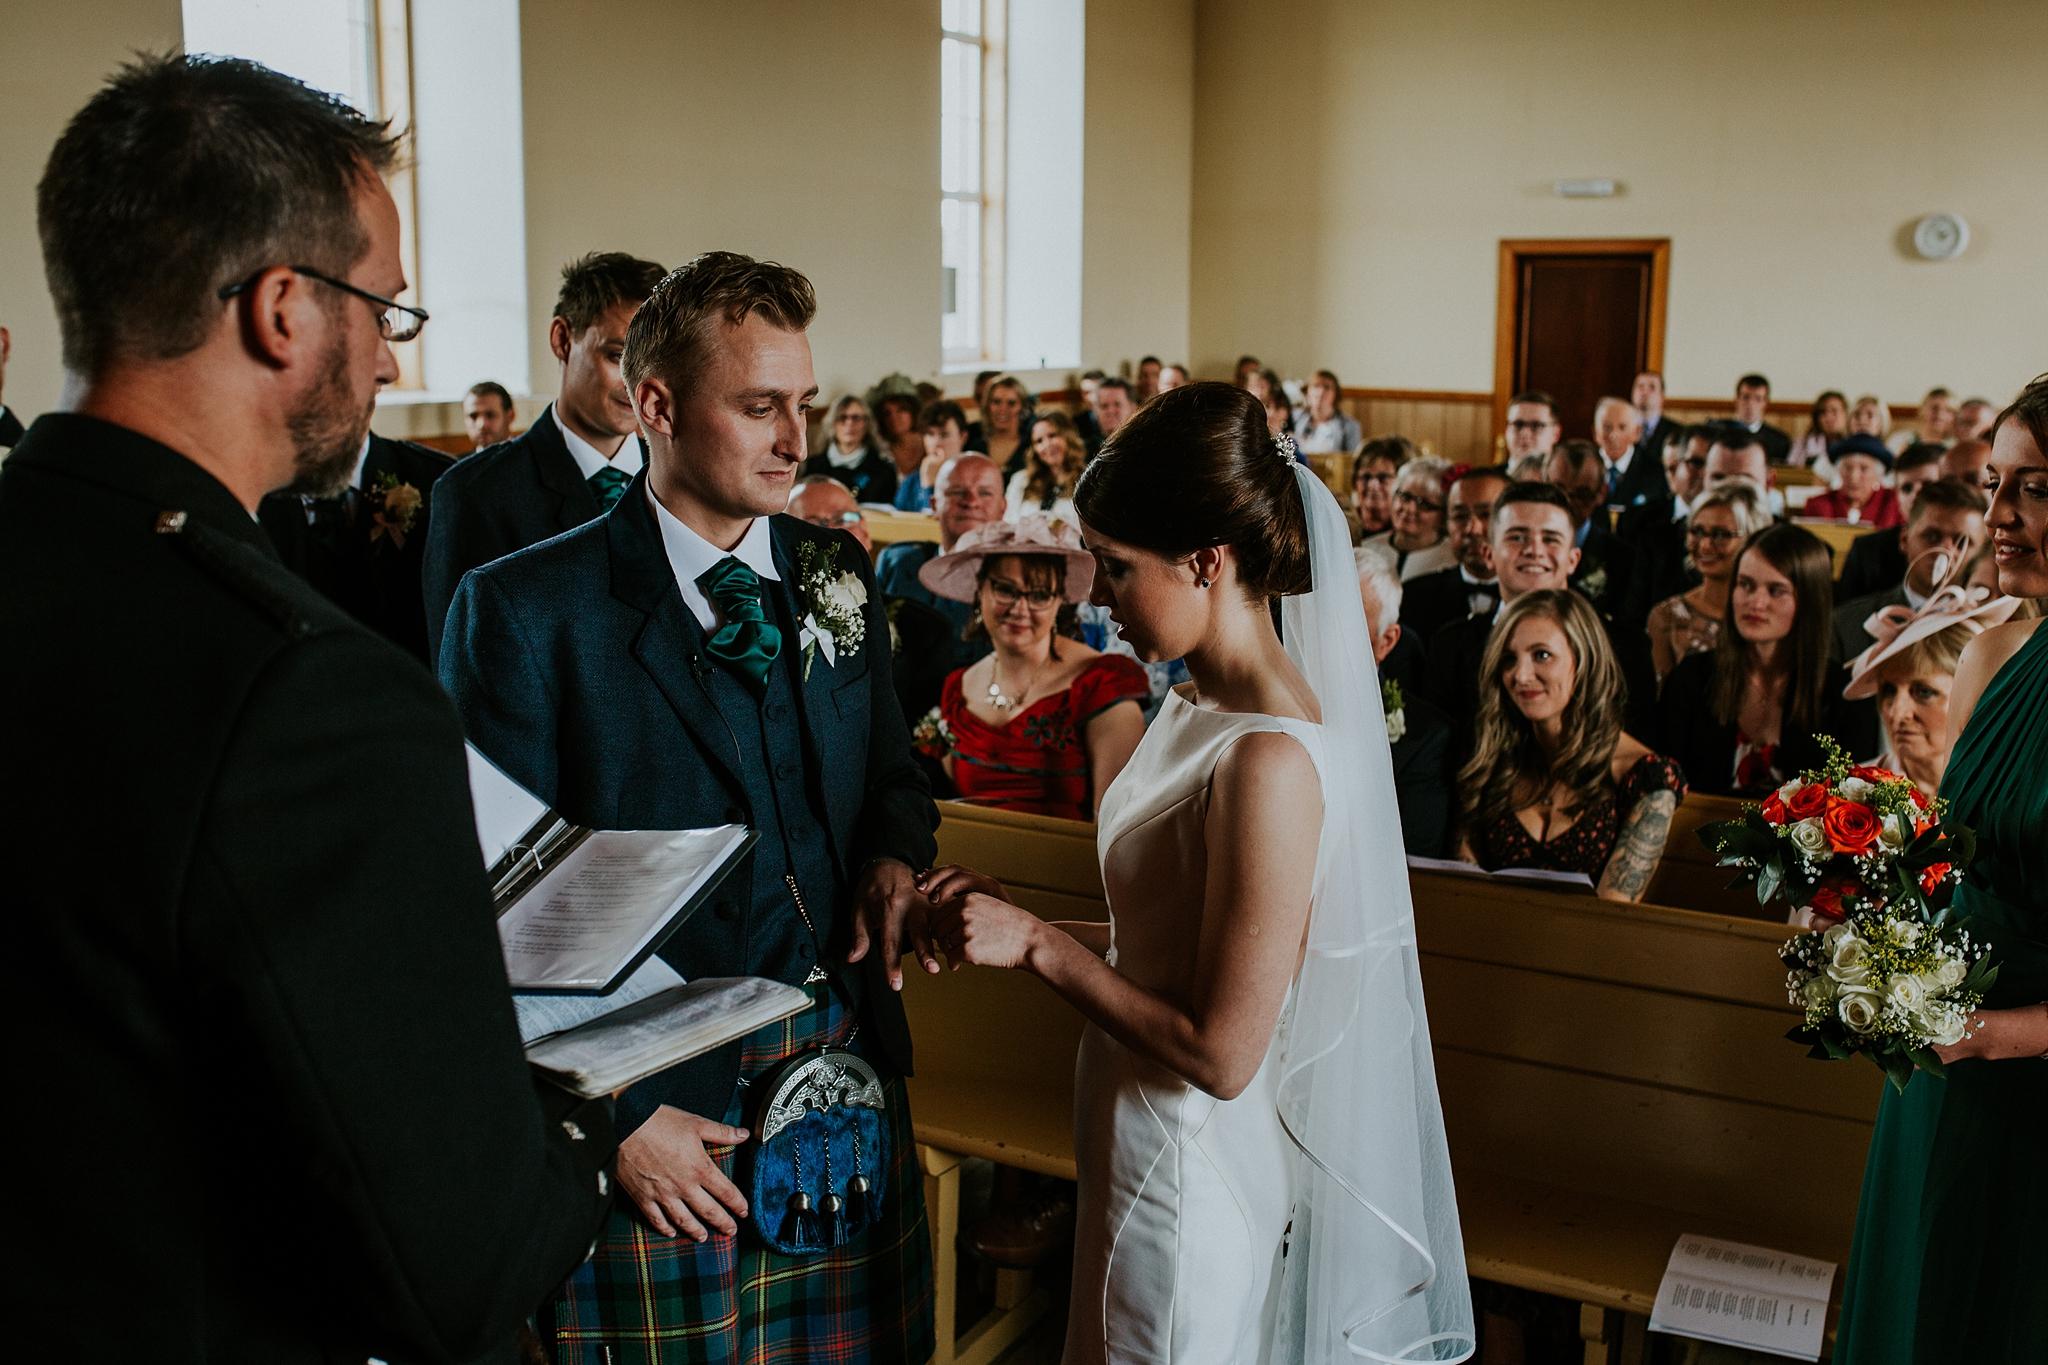 Linda&Shockie_northuist_wedding_photographer-22.JPG